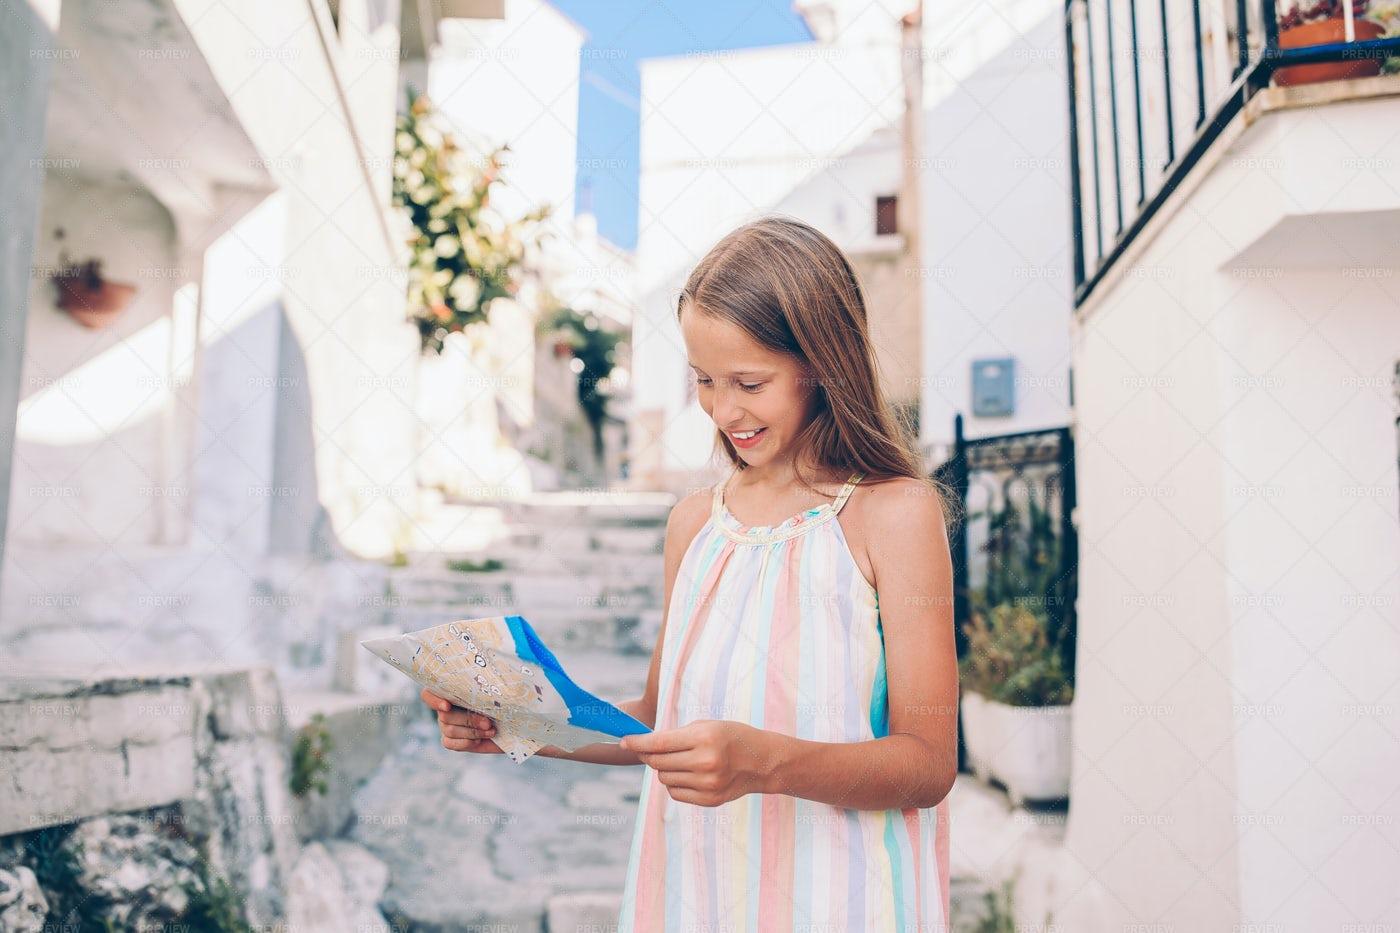 Tourist Girl With A Map: Stock Photos